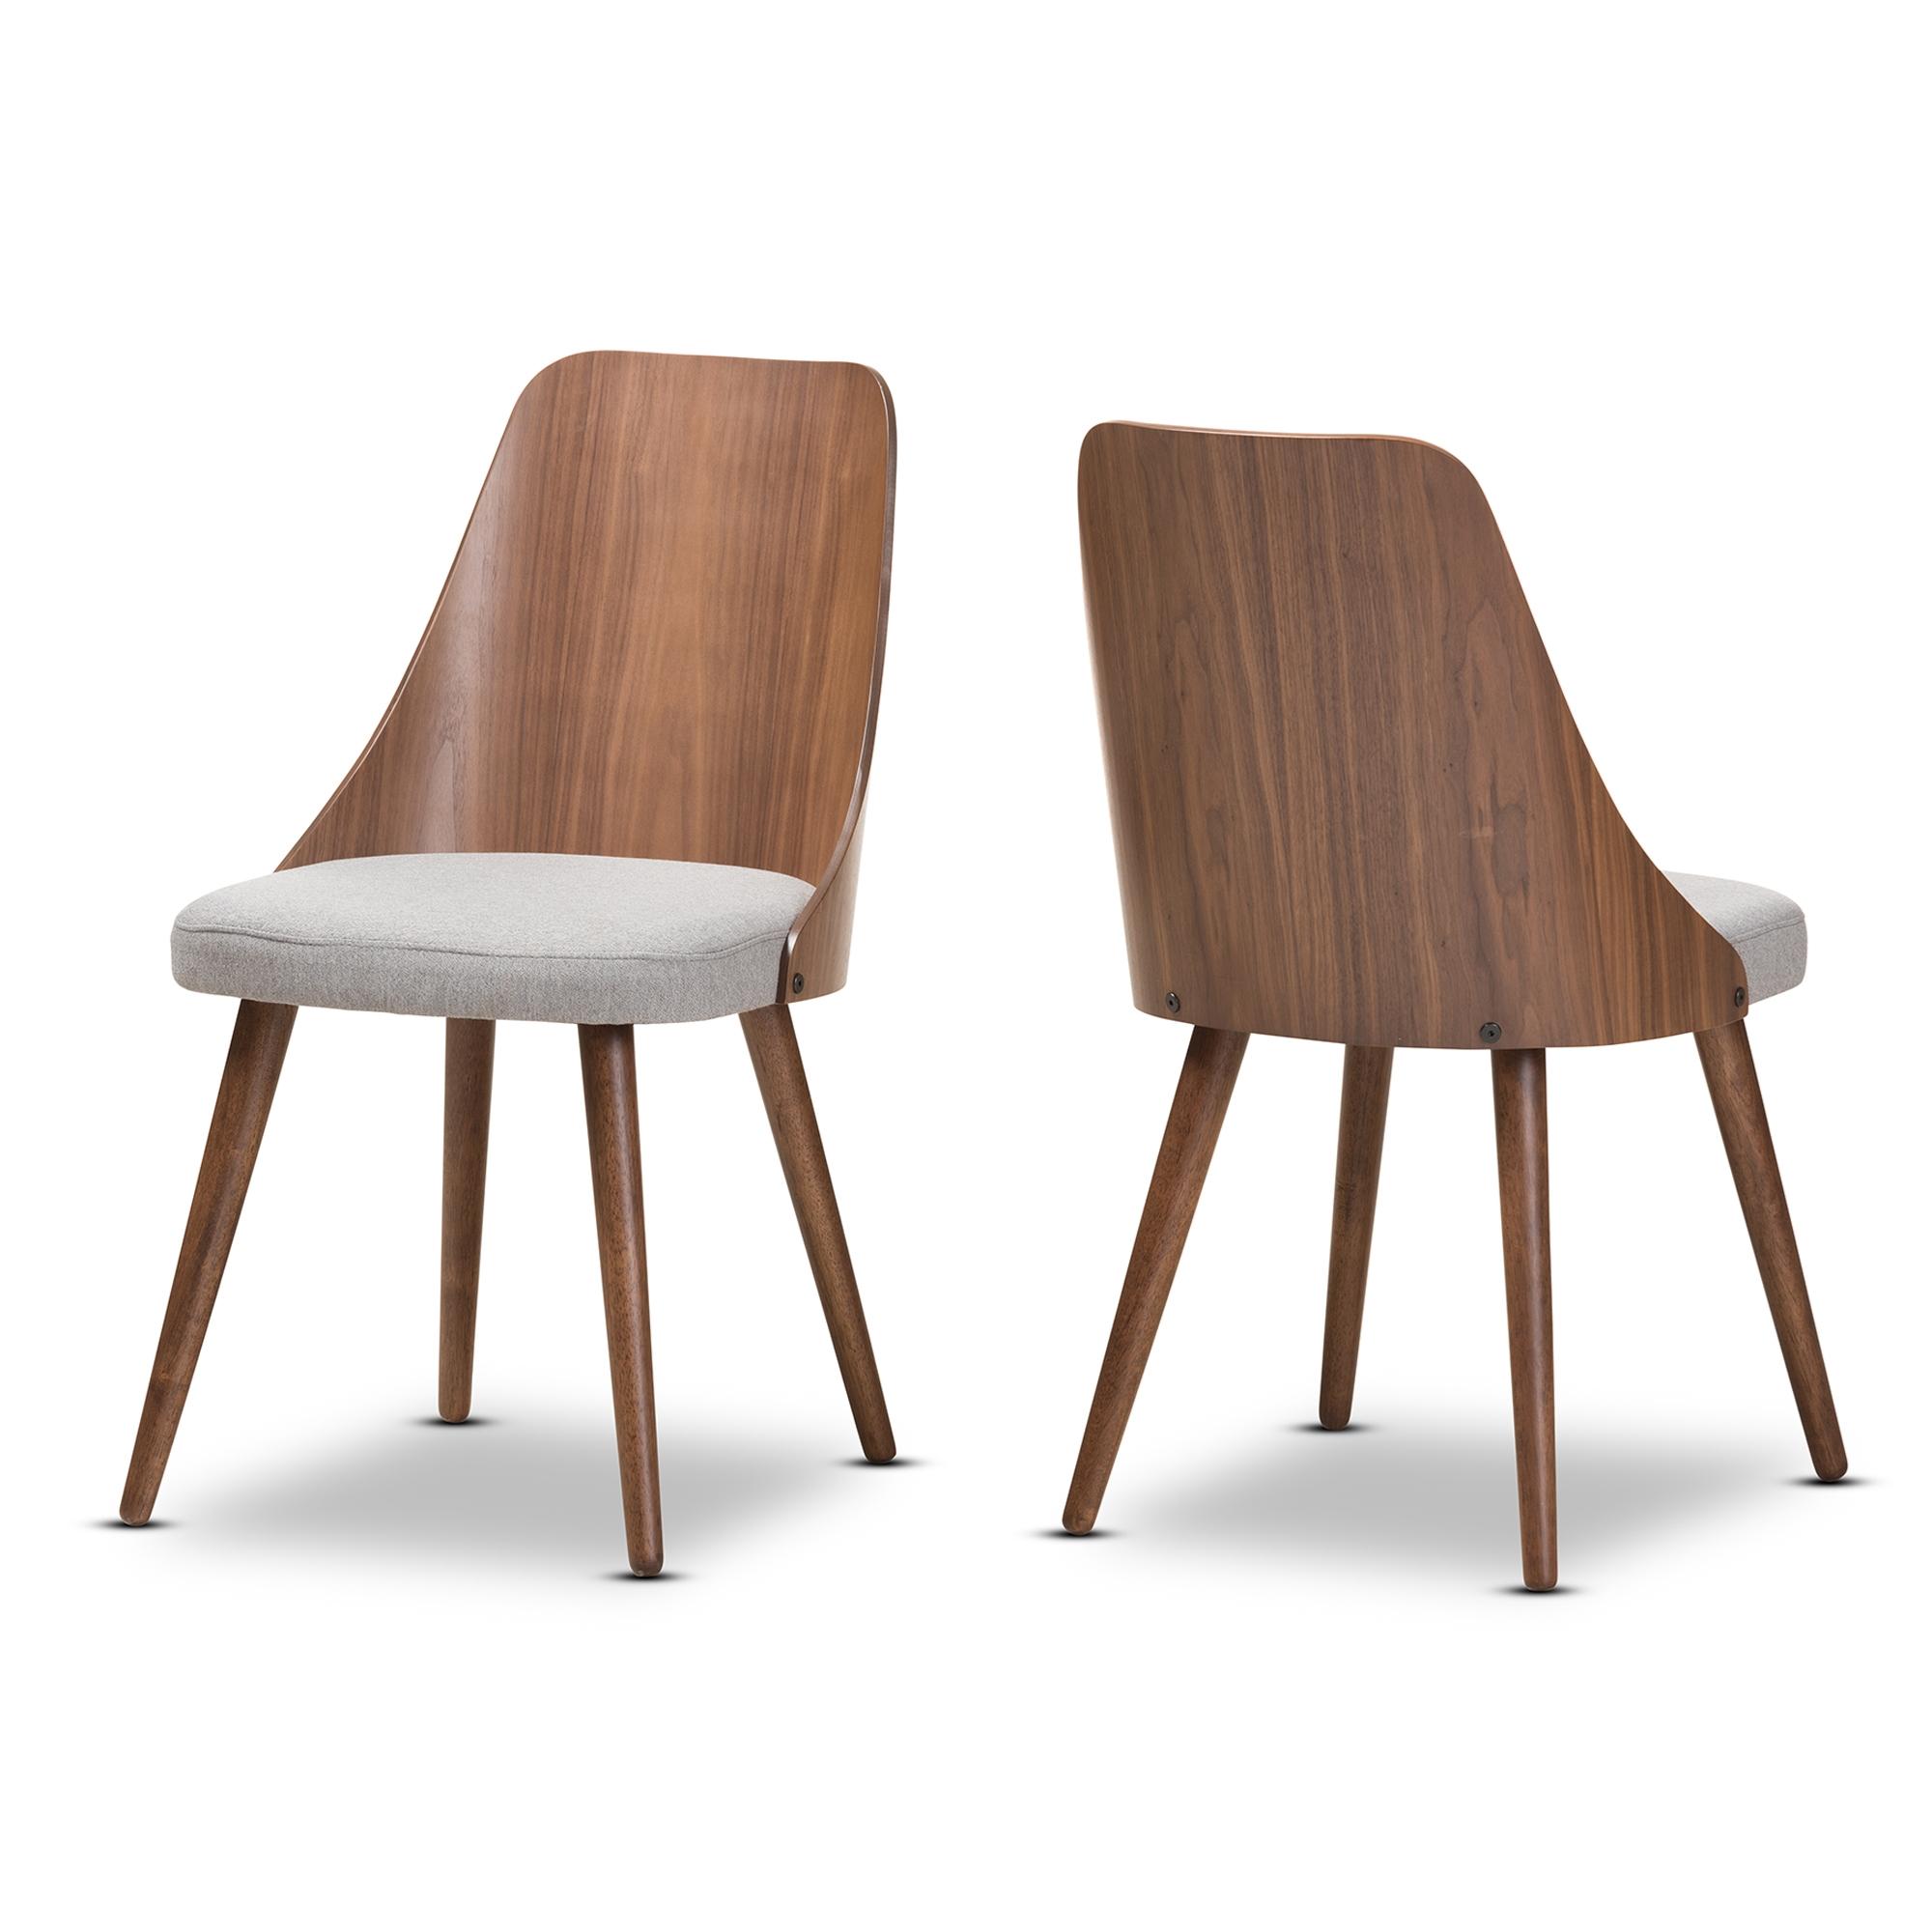 Baxton Studio Romily Mid Century Modern Walnut Wood Light Grey Fabric Dining  Chair Set Of